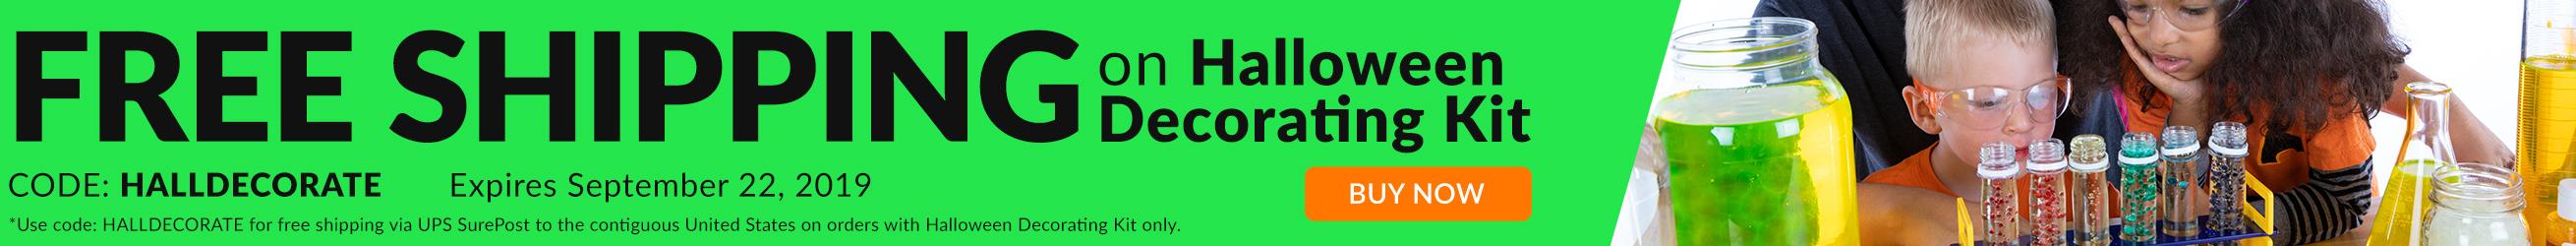 Free Shipping on Halloween Decorating Kit